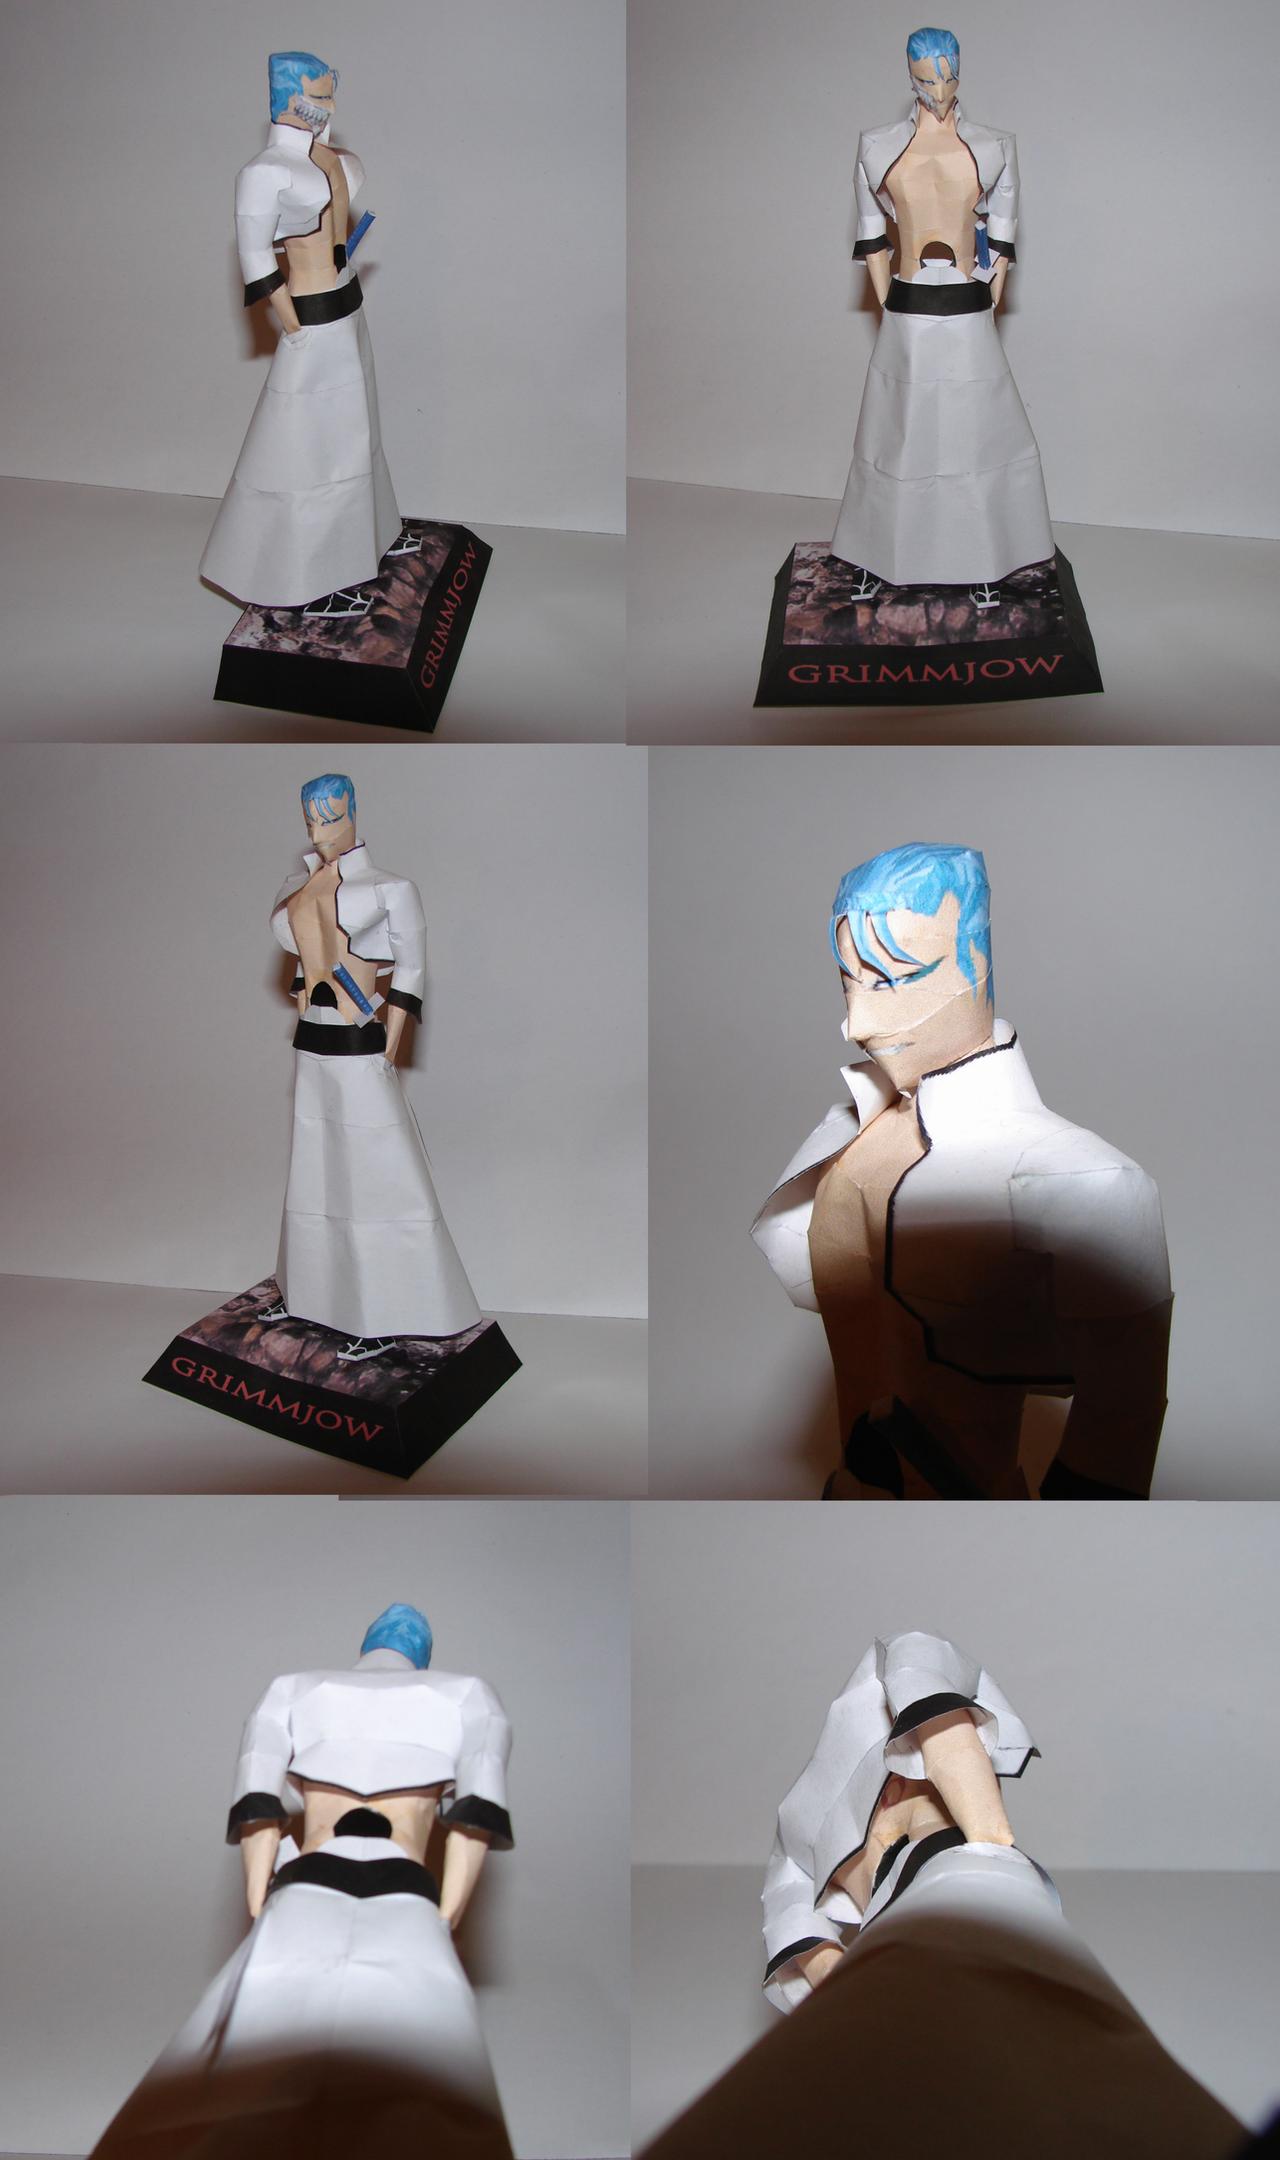 Grimmjow papercraft model by Weirda208